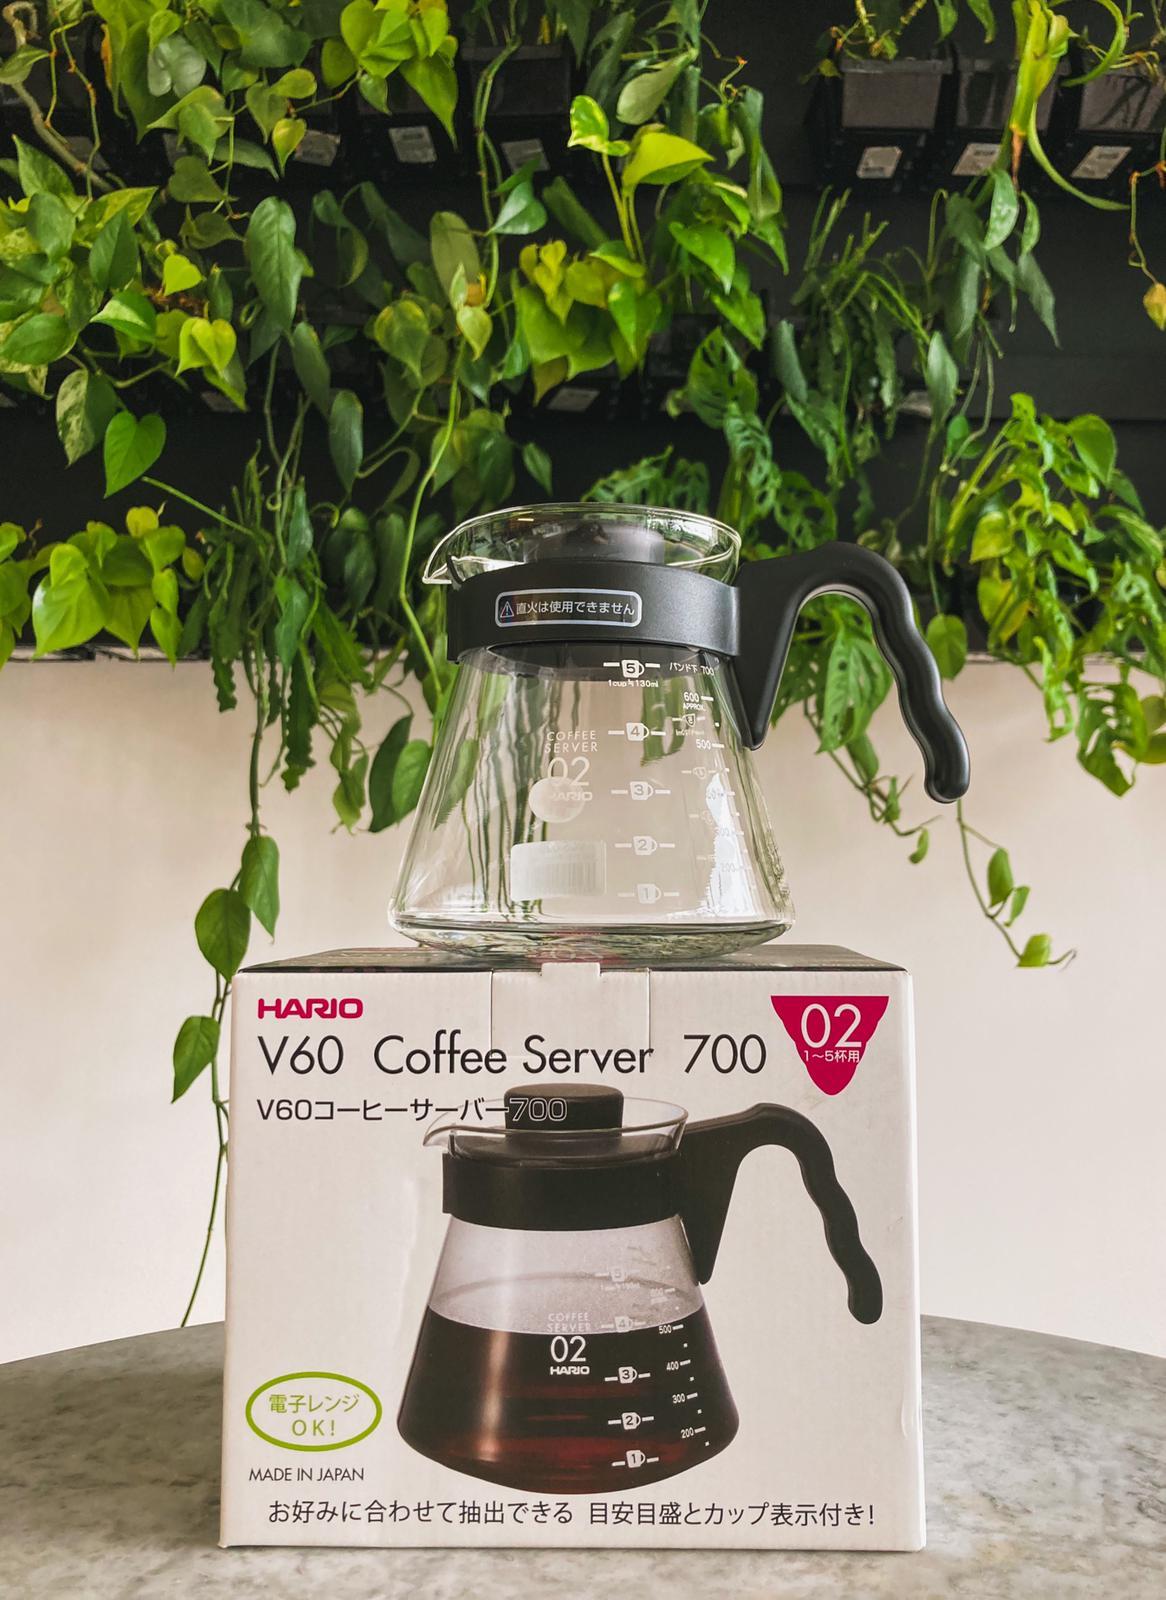 Hario V60 Coffee Server